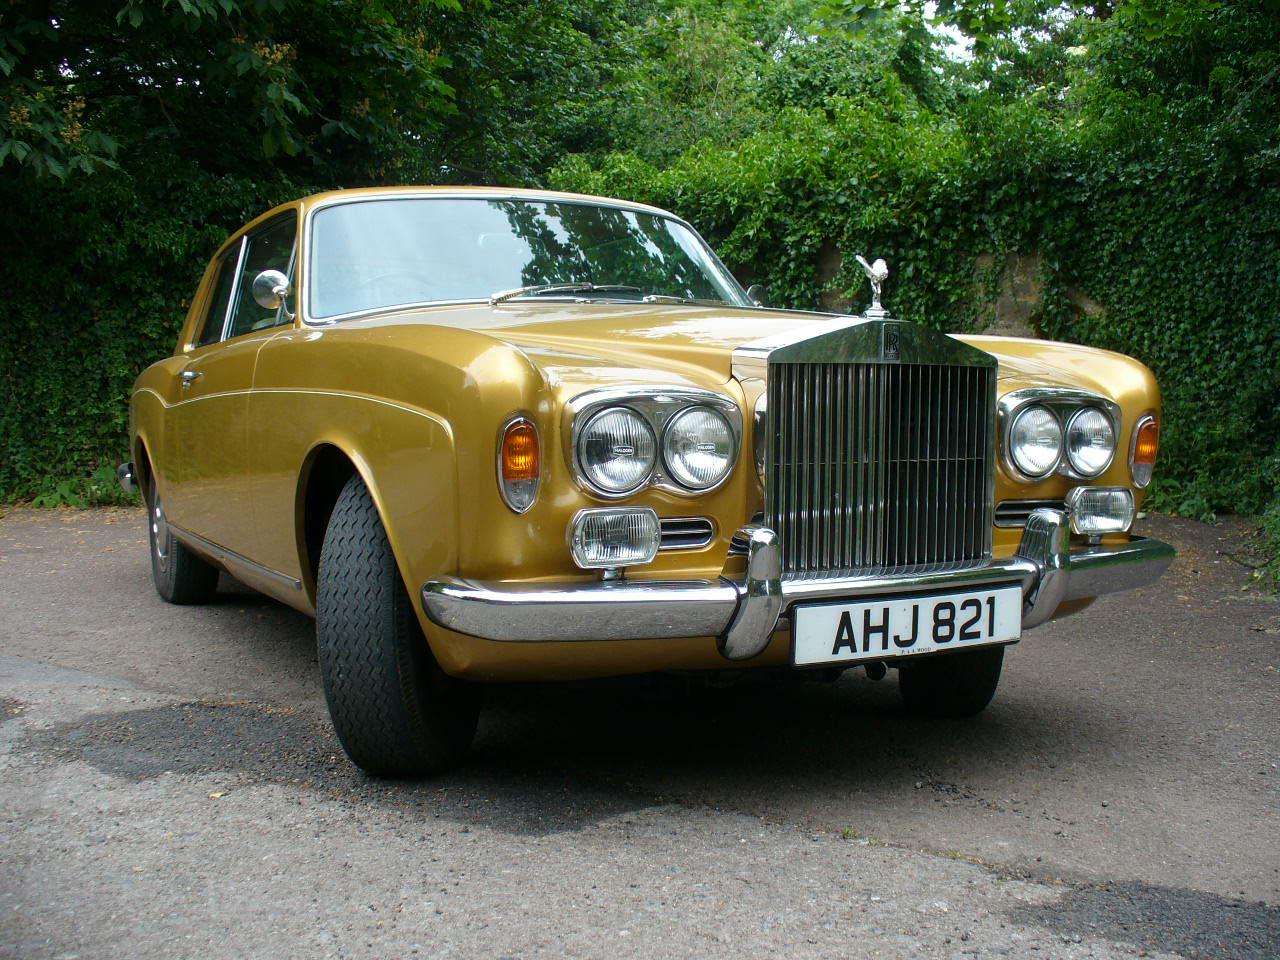 Rolls royce corniche ii coupe fixed head 1972 two door coupe crh12709